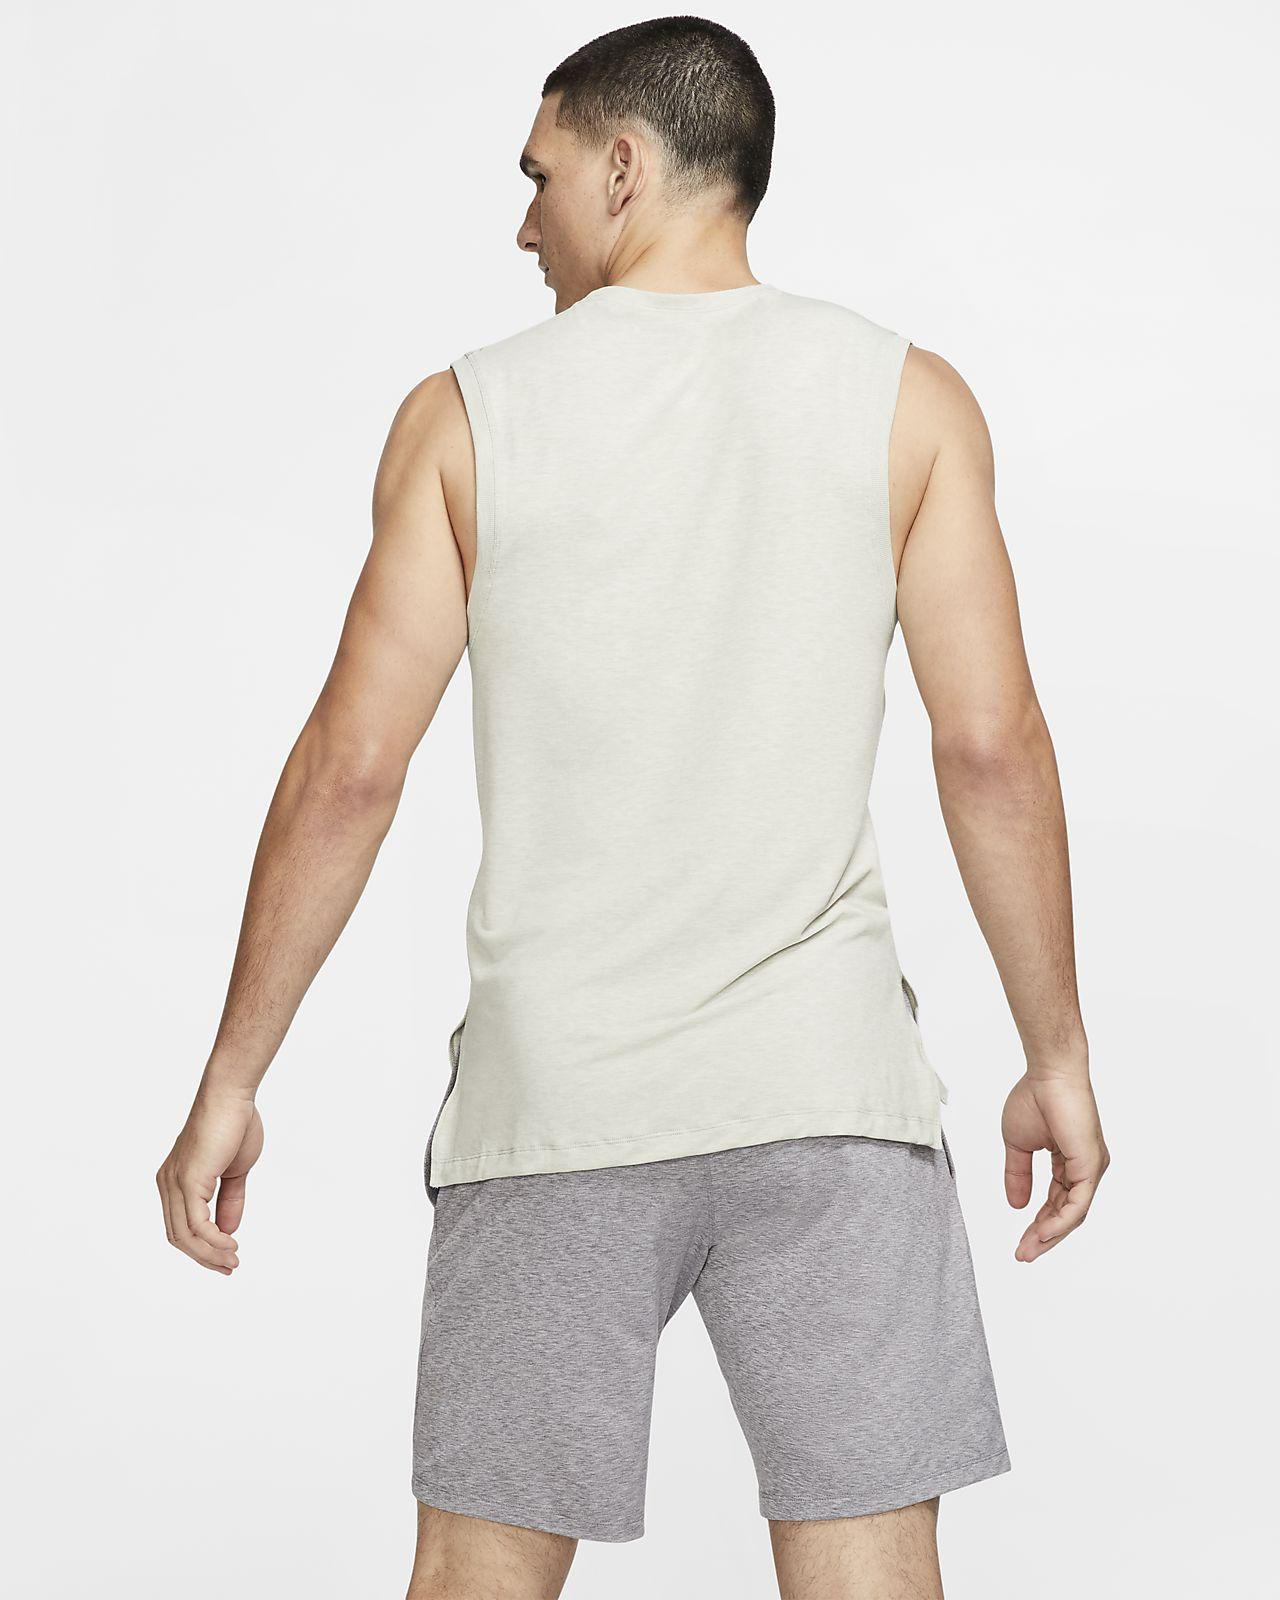 eec7970872 Nike Dri-FIT Men's Yoga Training Tank. Nike.com GB